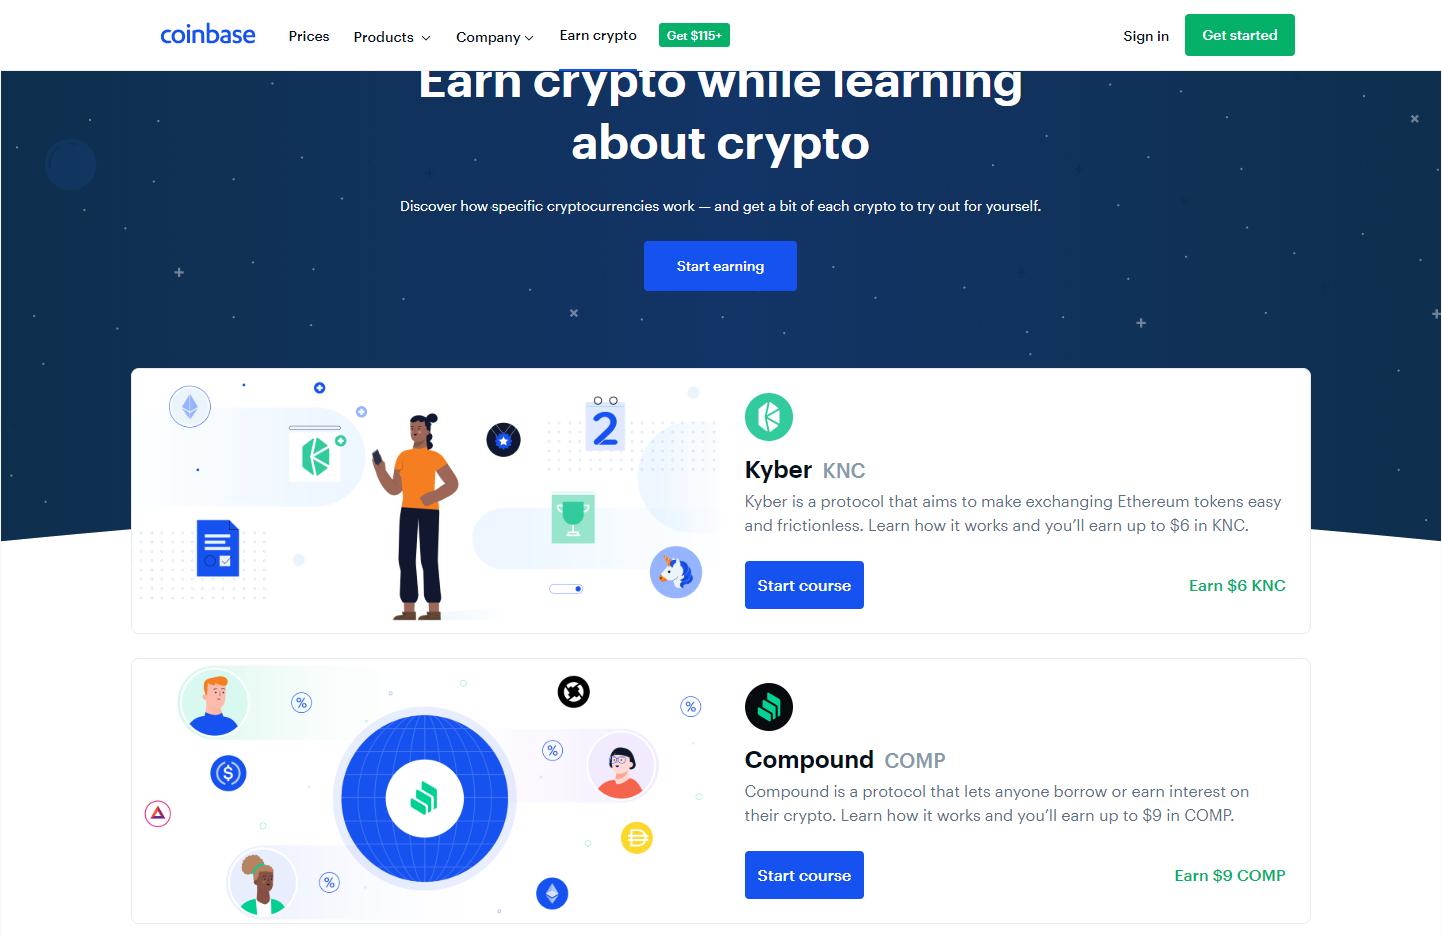 coinbase earn